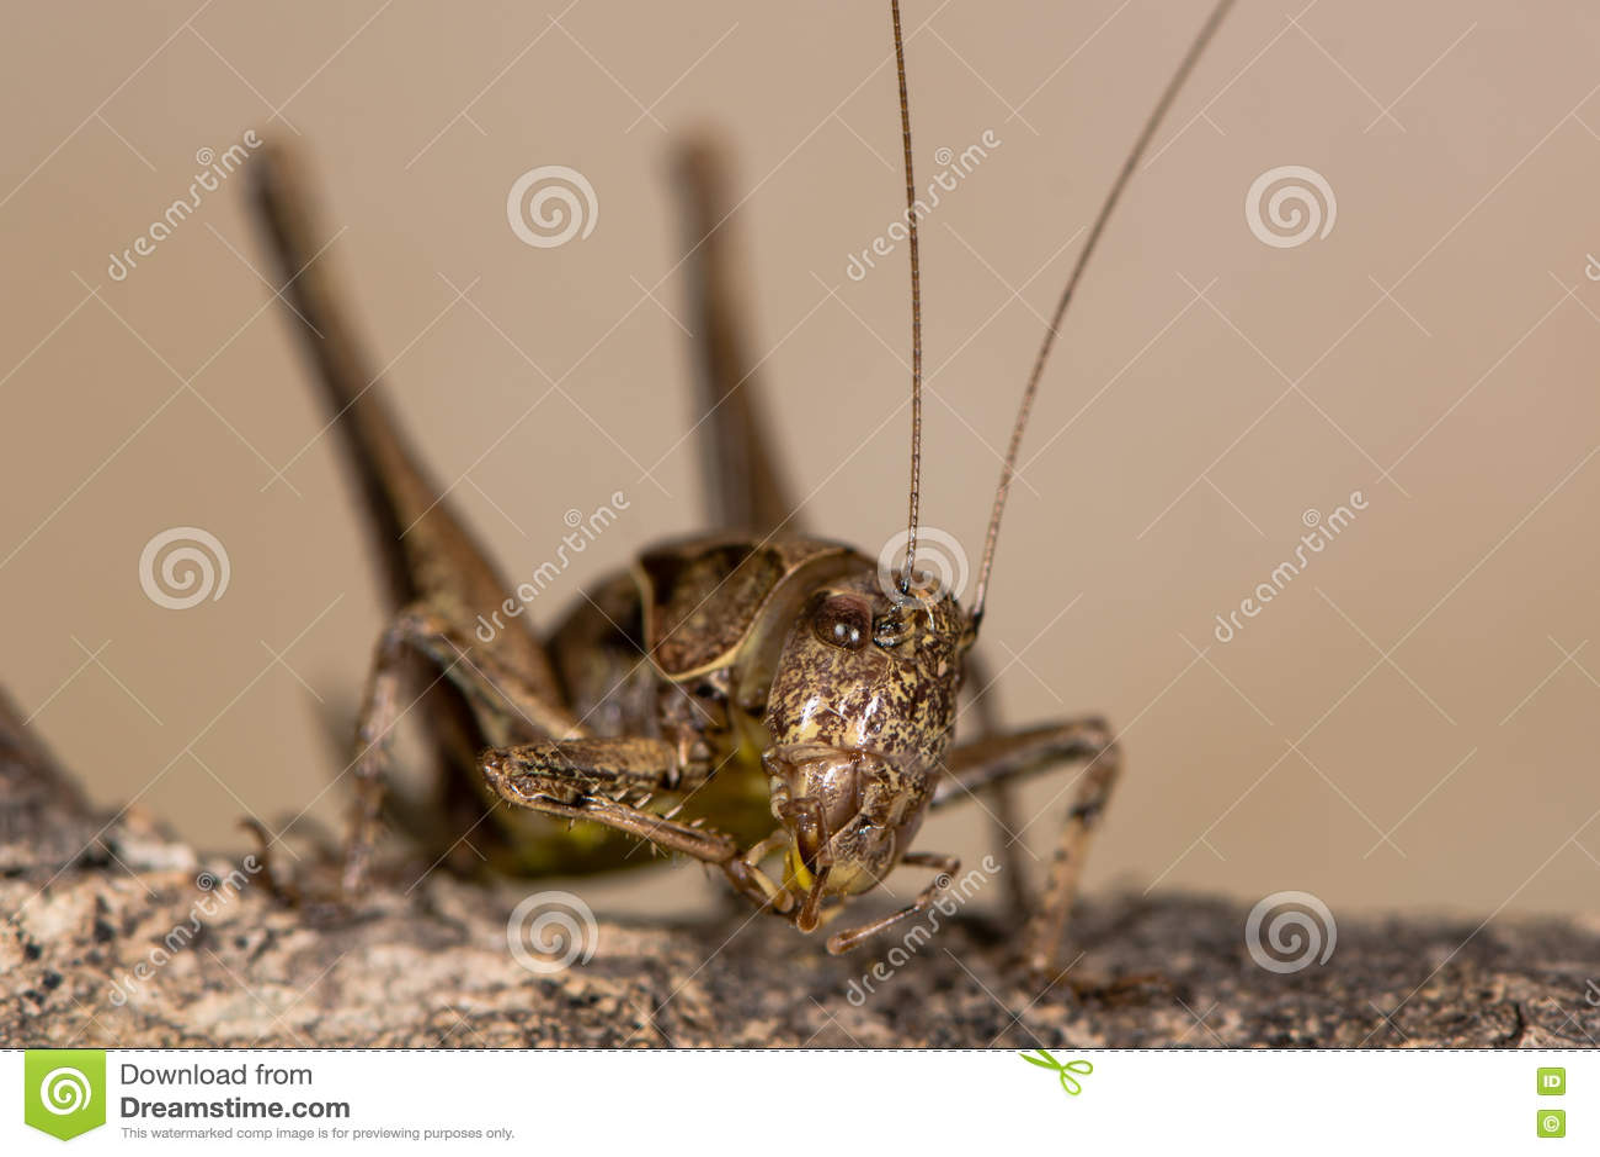 Enfeitar-se escuro do grilo do arbusto (griseoaptera de Pholidoptera)